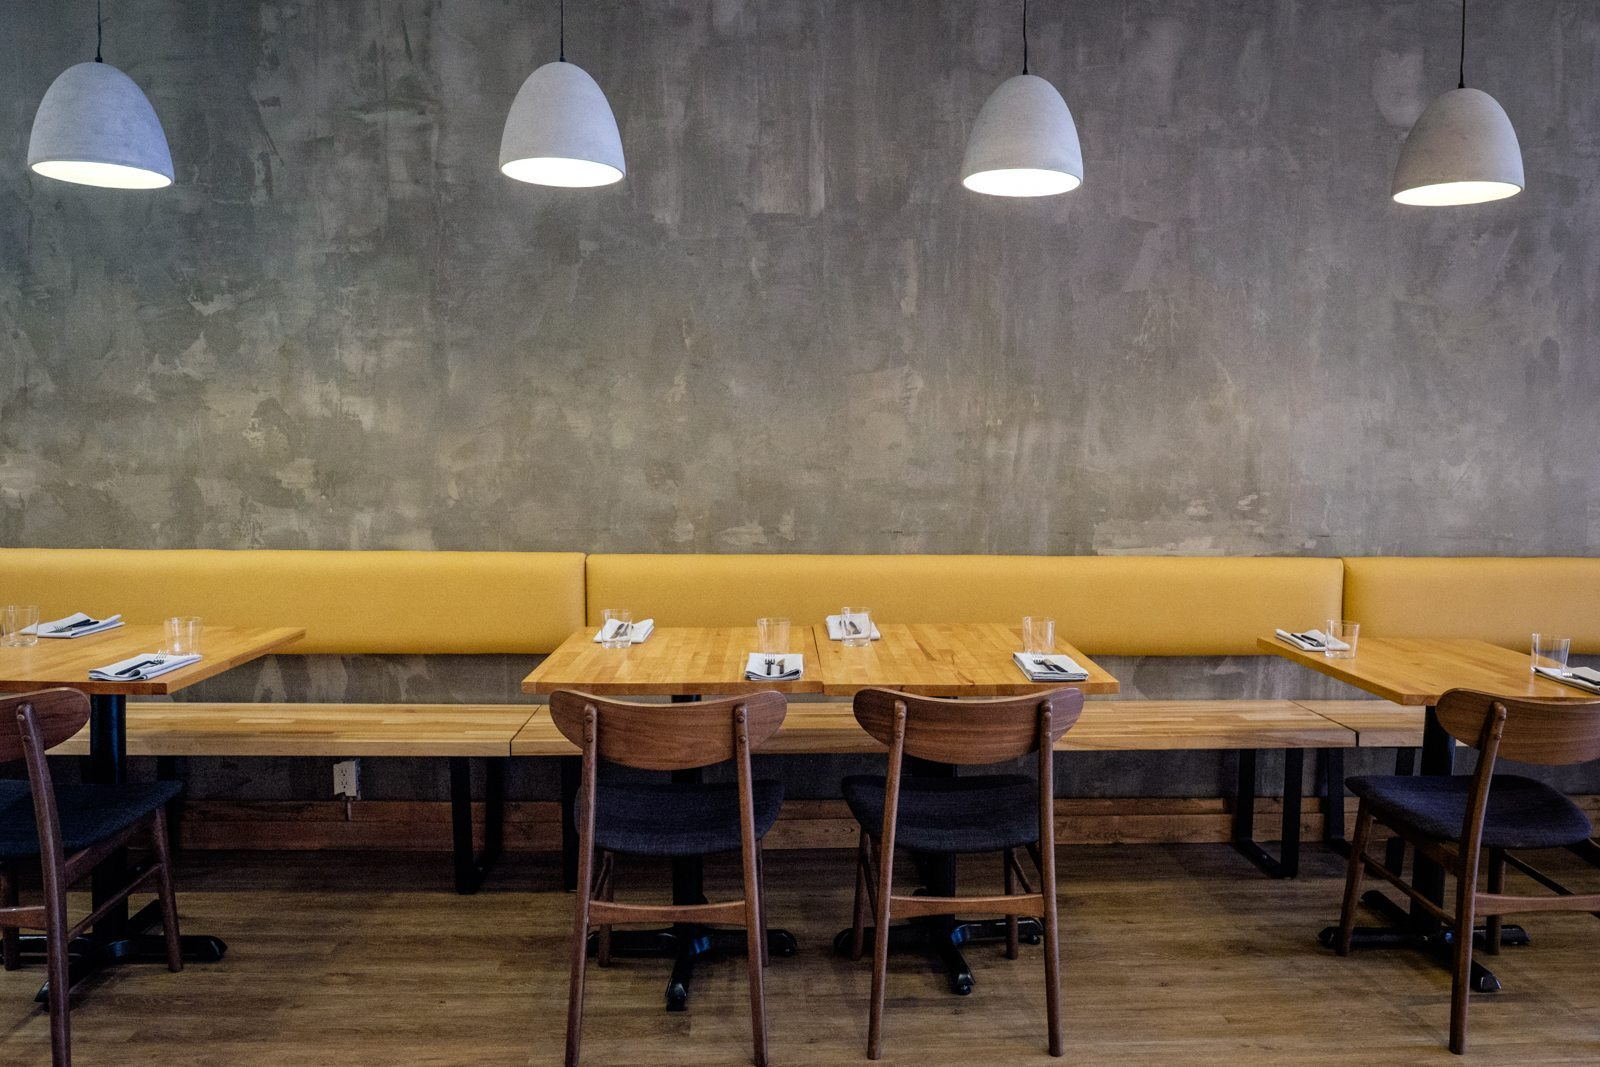 toronto-restaurants-canis-queen-west-canadian-dining-room-1